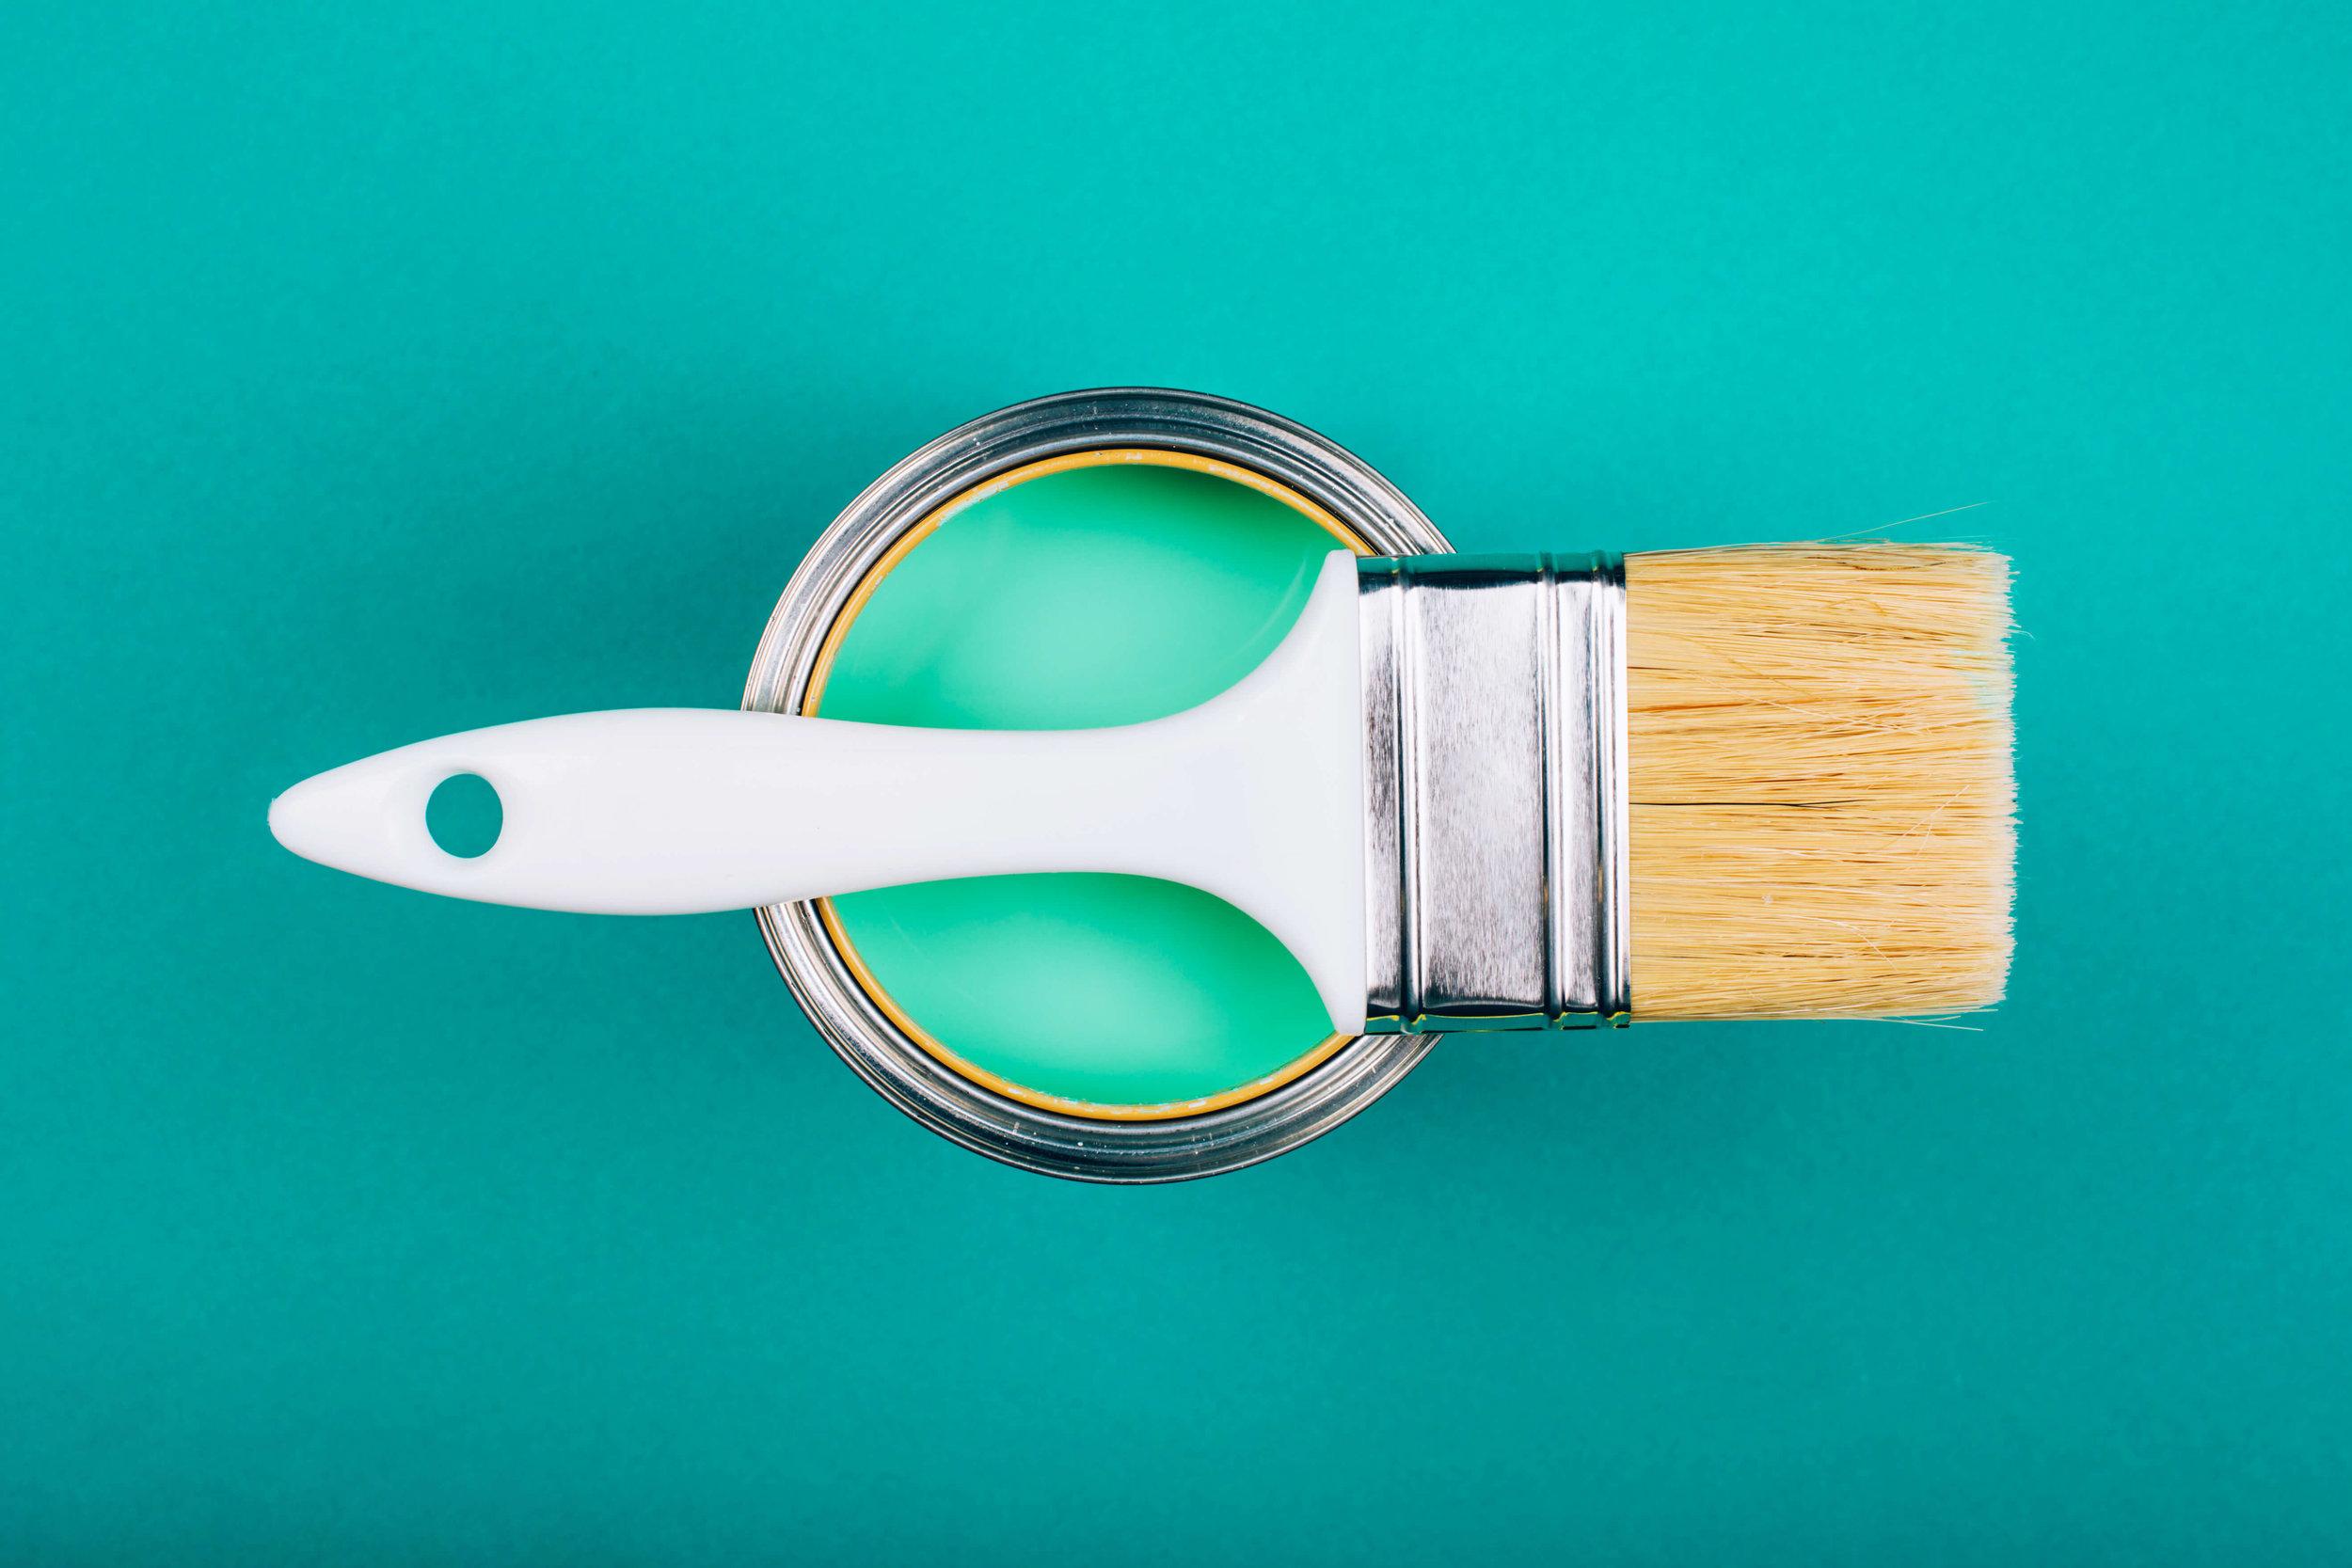 Paint & Supplies